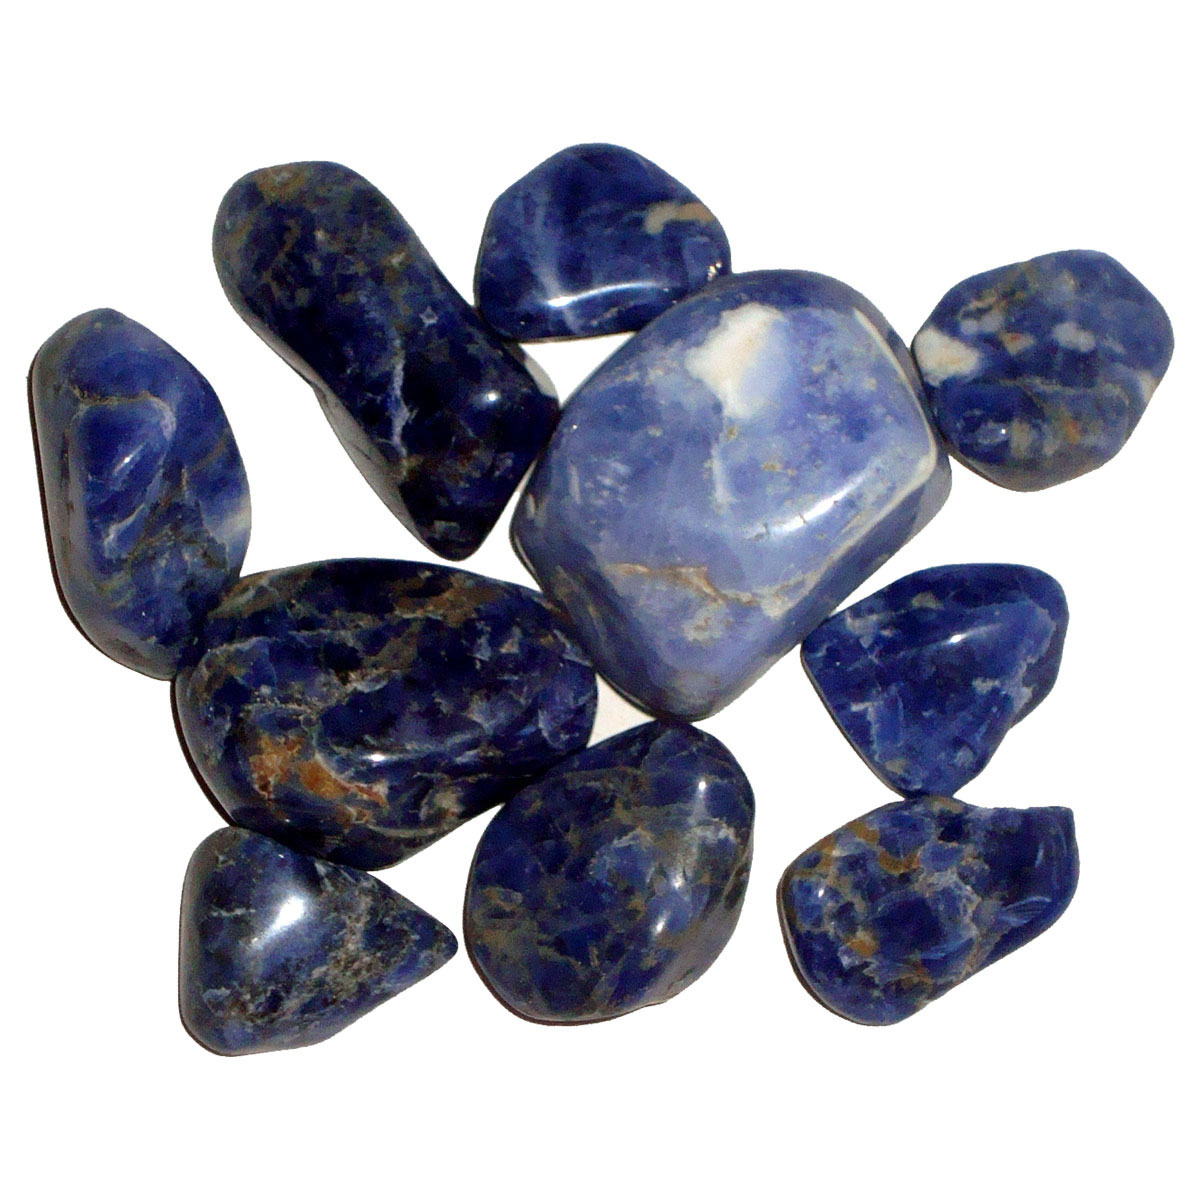 Tumbled Stones - SODALITE